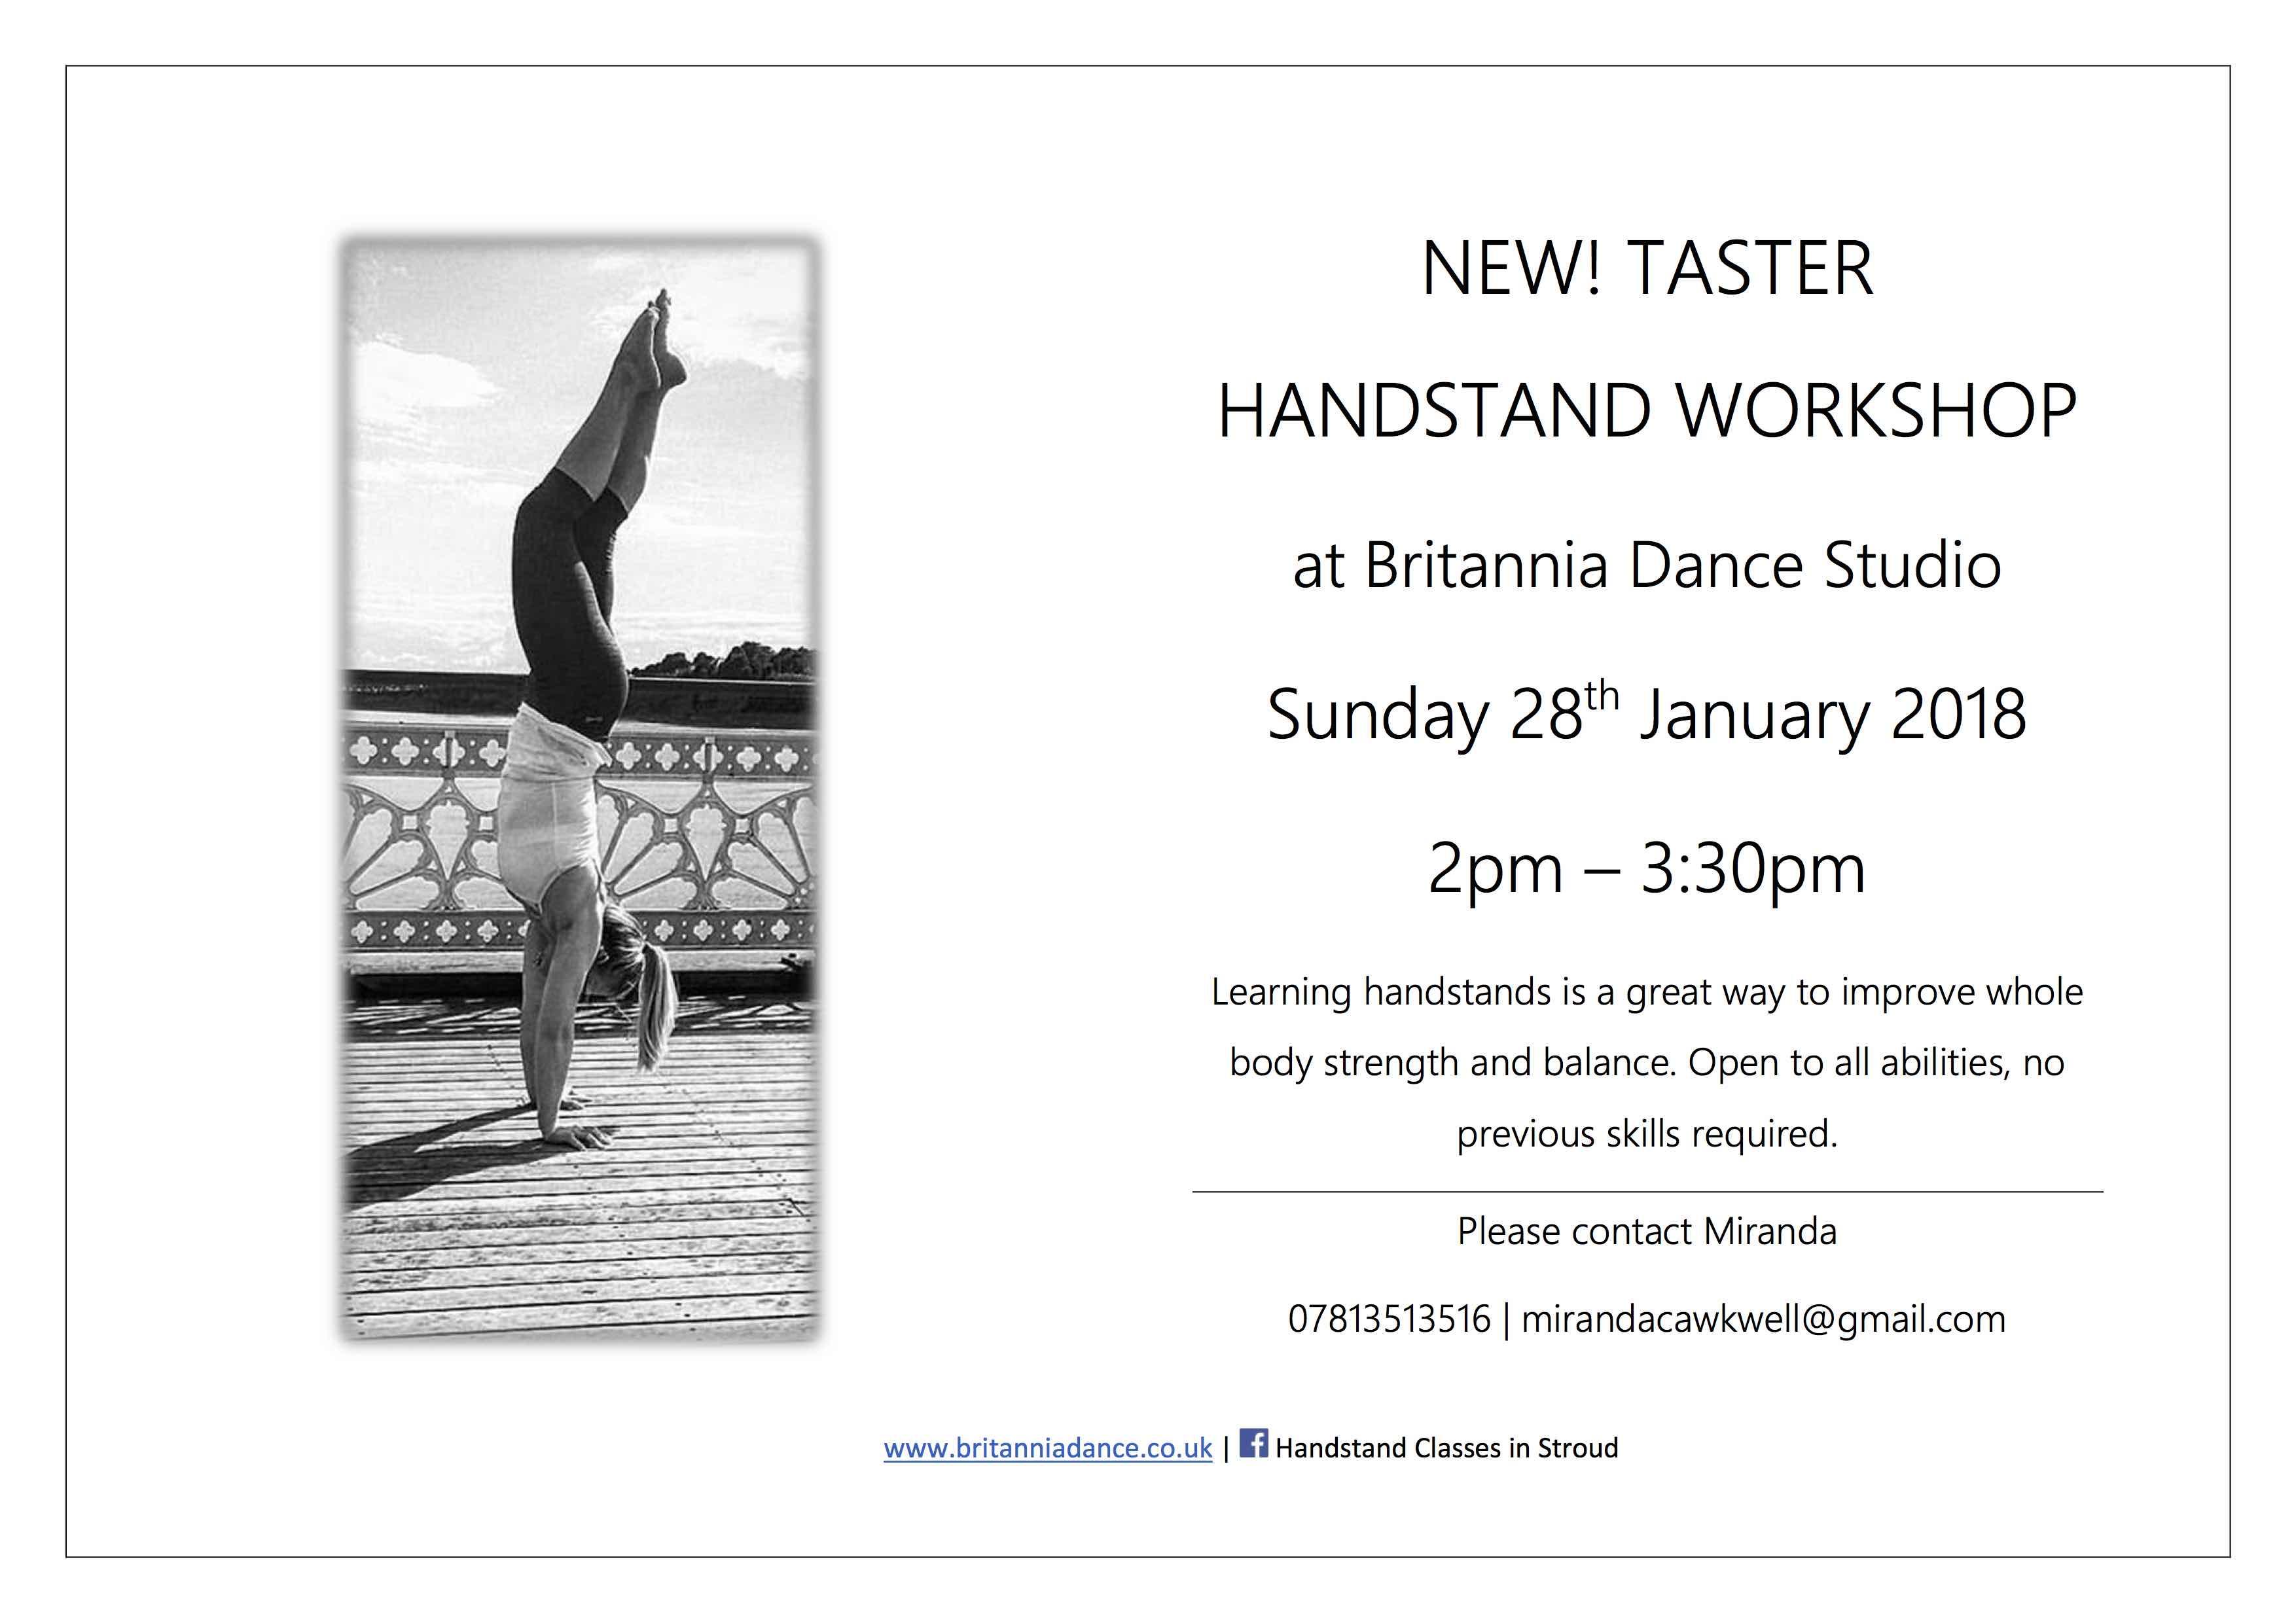 Miranda Handstand Workshop 28th Jan 2018